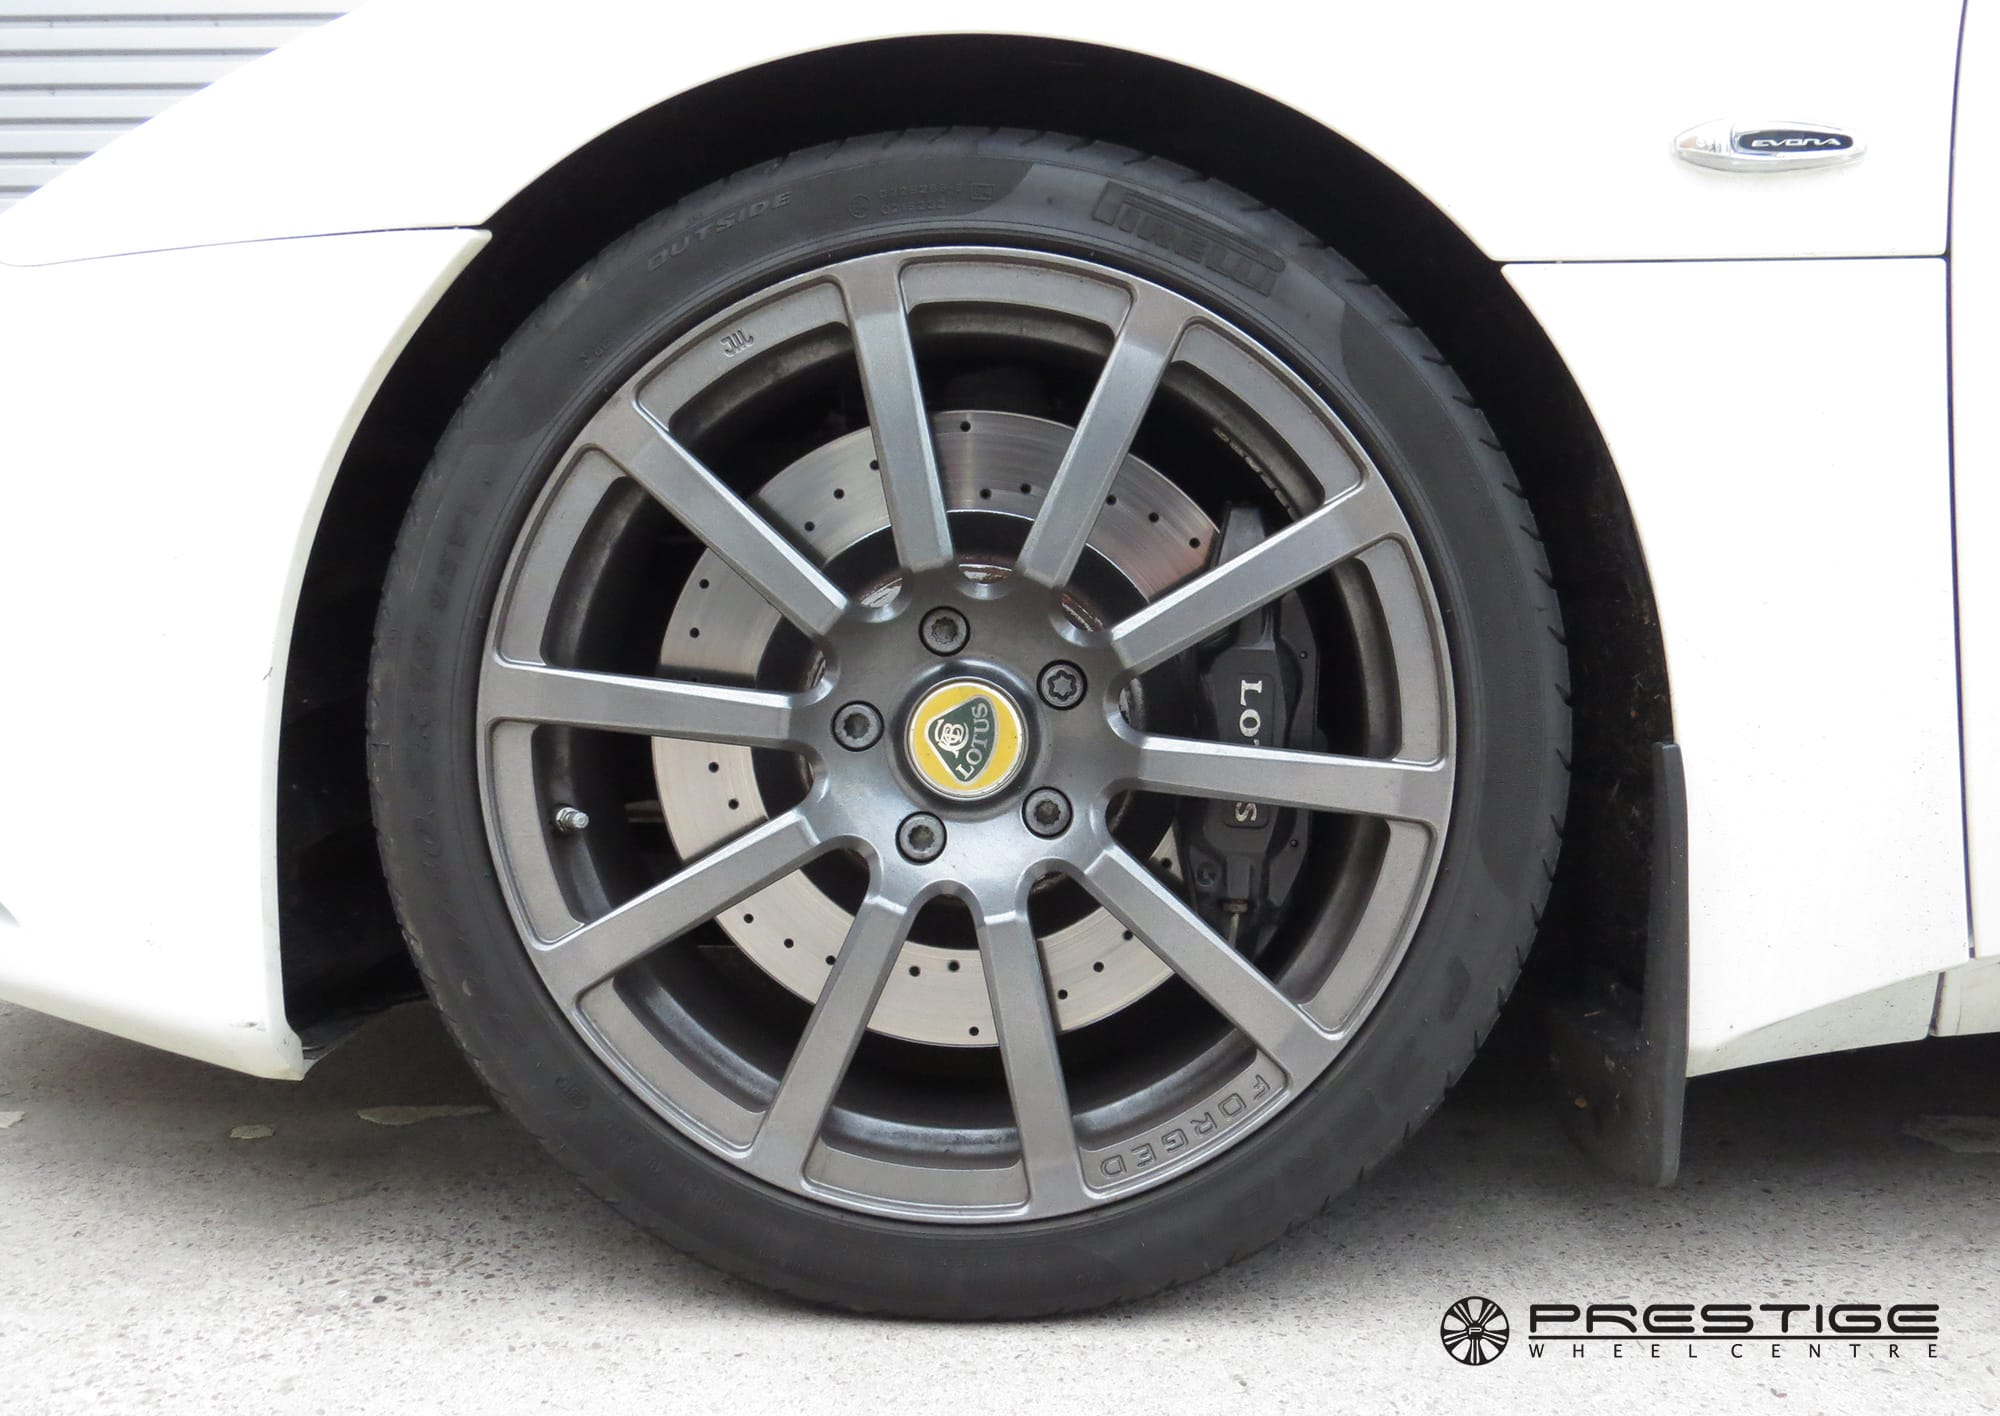 Lotus Evora Alloy Wheel Refinished To High Gloss Black